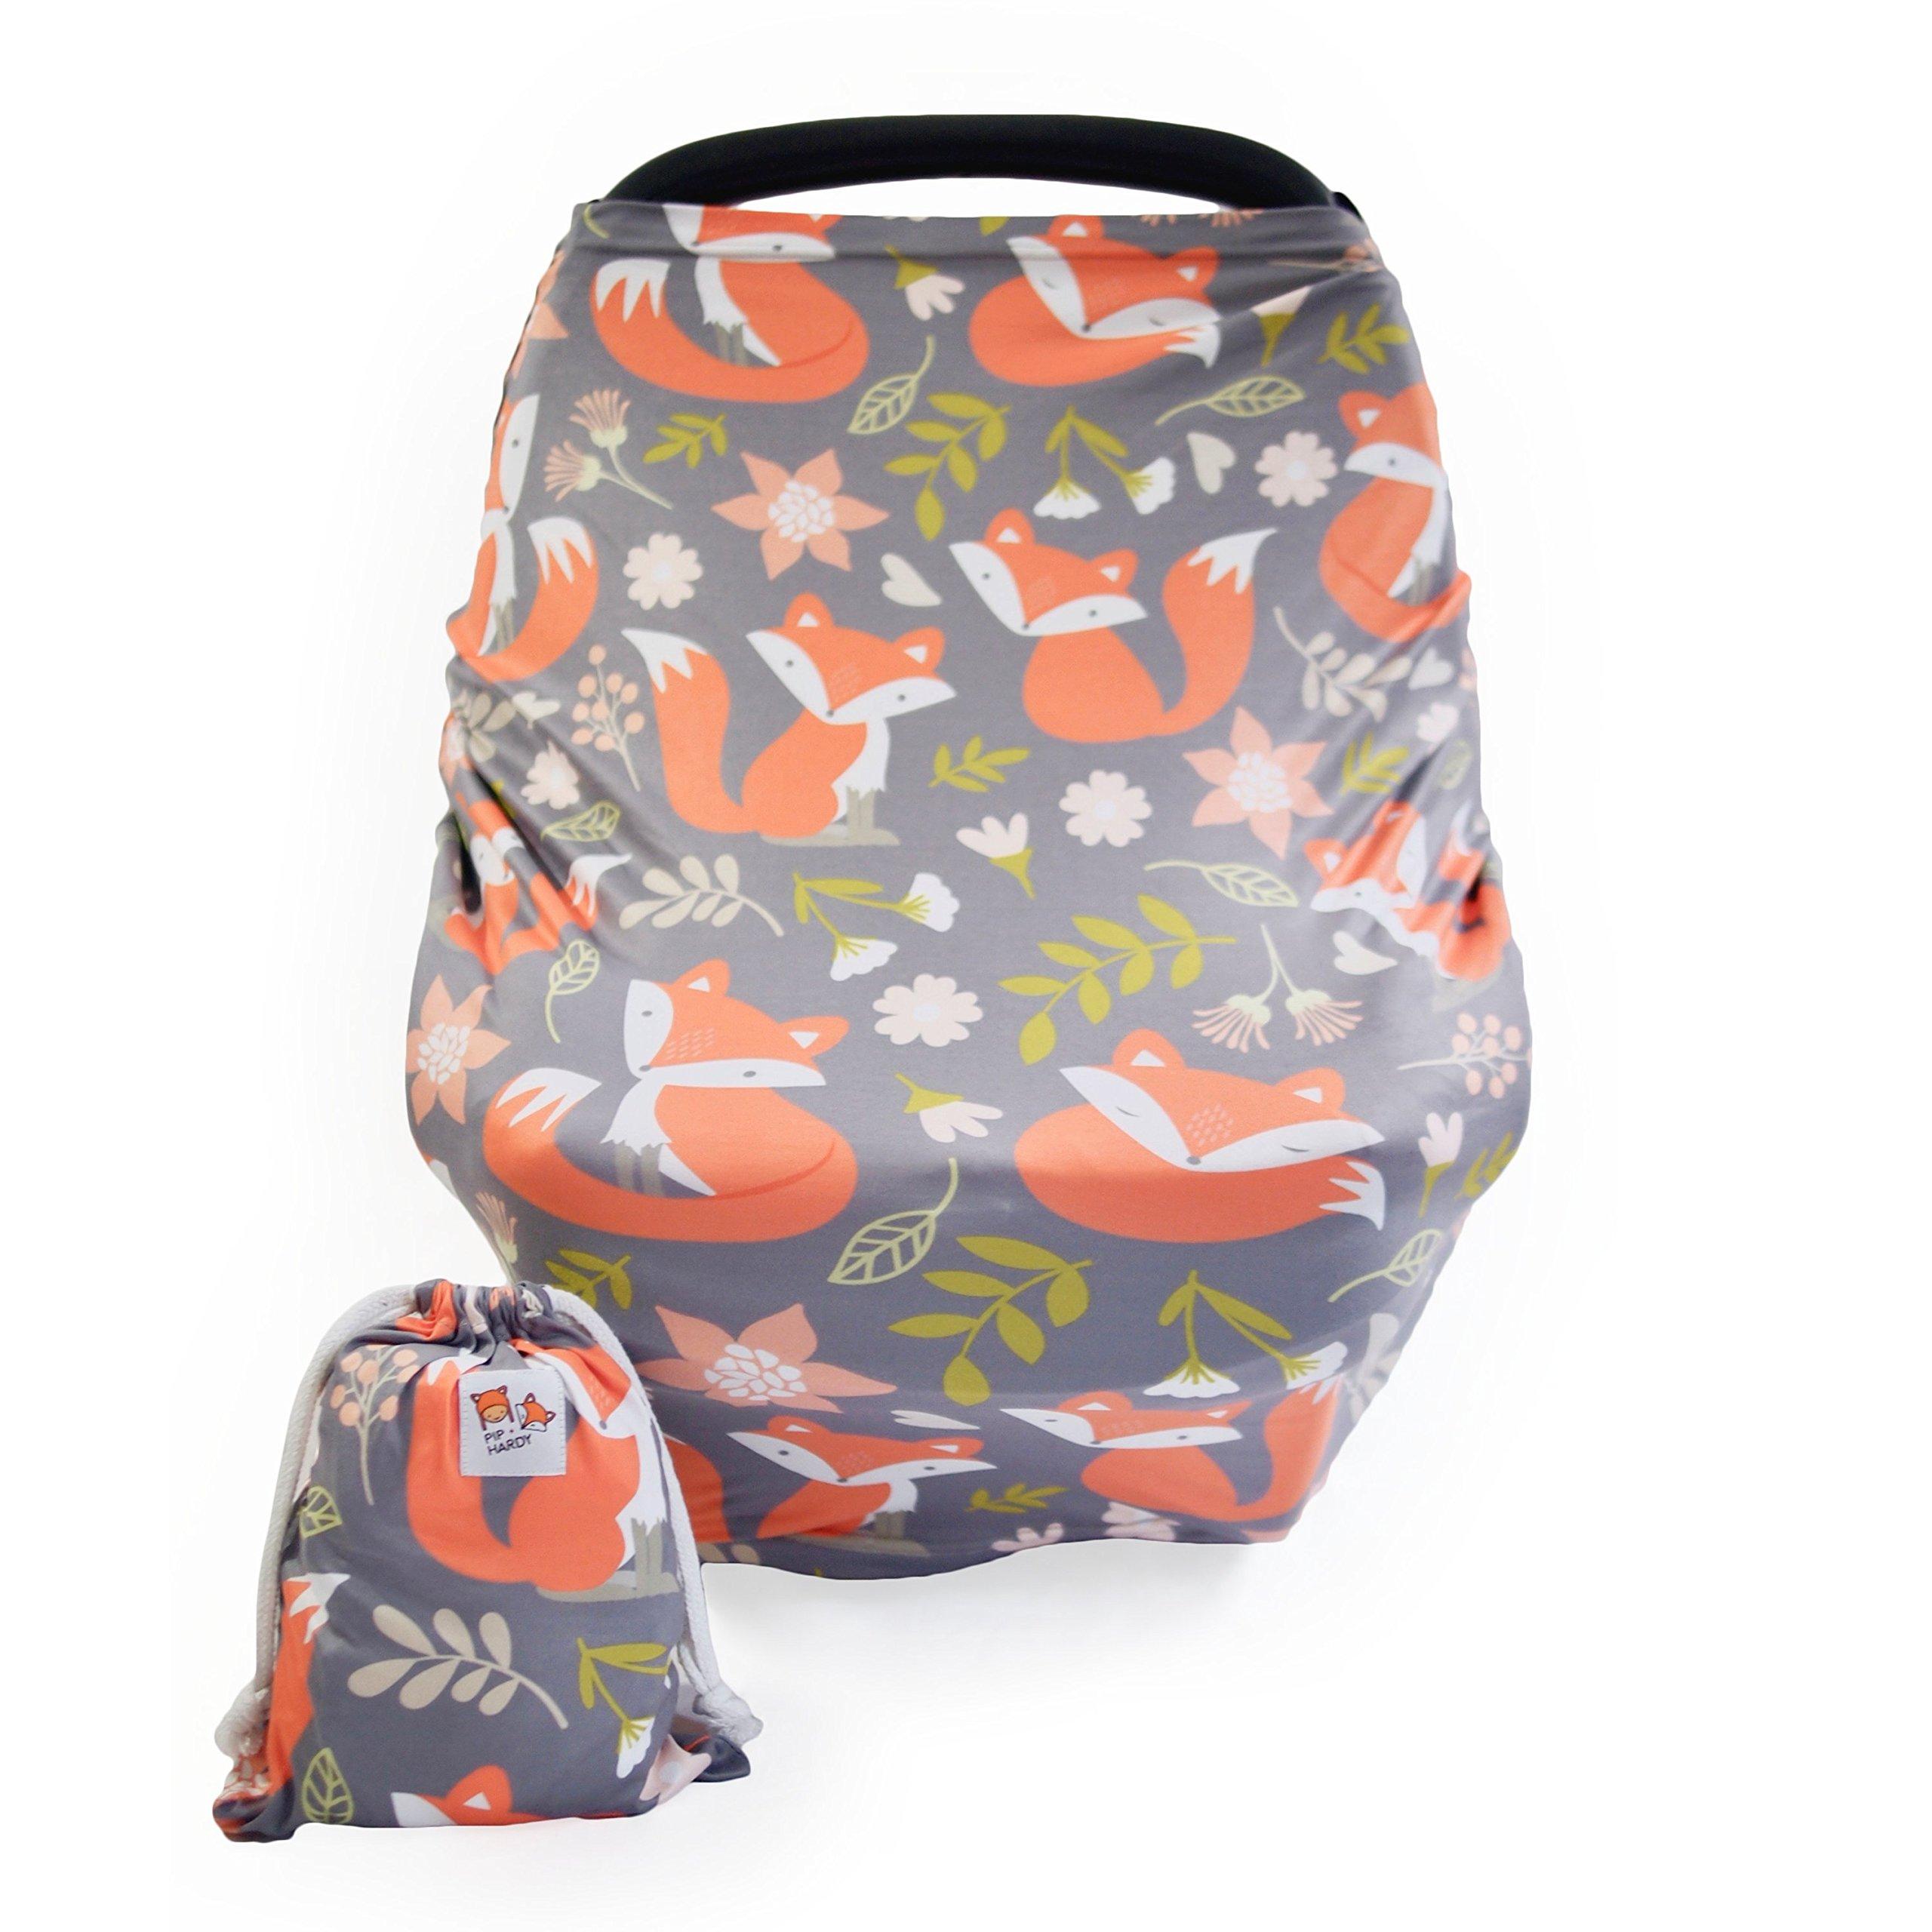 Baby Nursing & Breastfeeding Cover, Car Seat Canopy | Multi-use - Woodland Fox